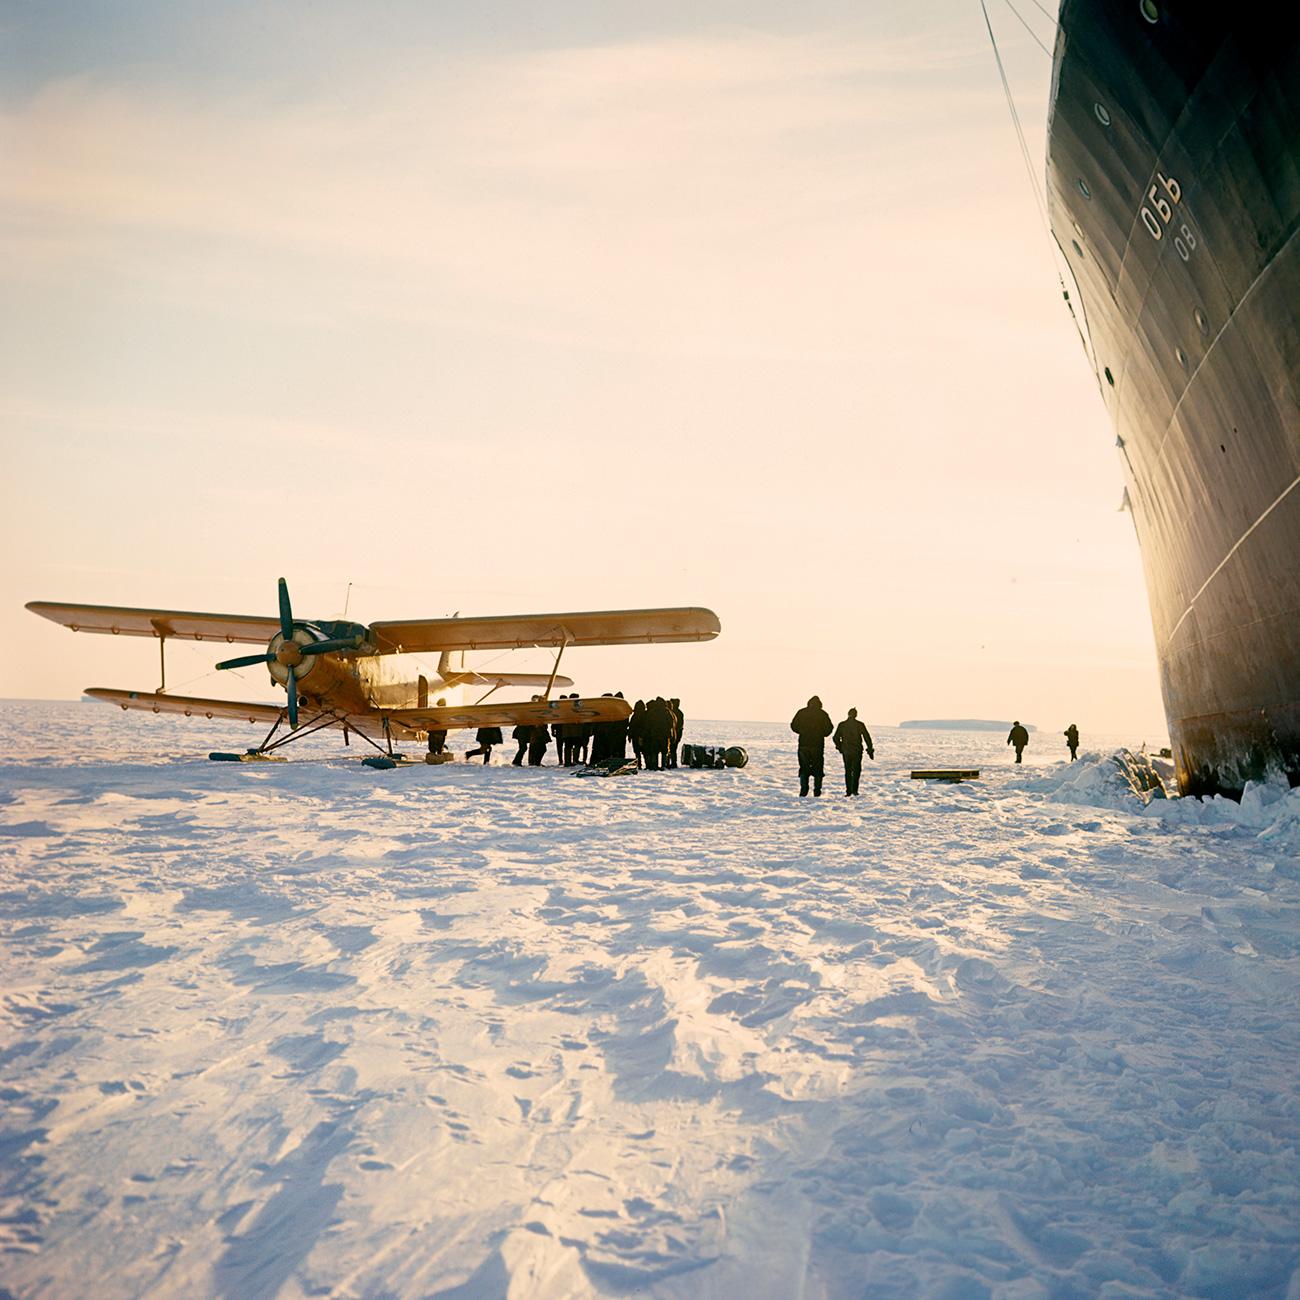 Pesawat An-6 di Antartika tahun 1967. Sumber: G. Koposov/RIA Novosti